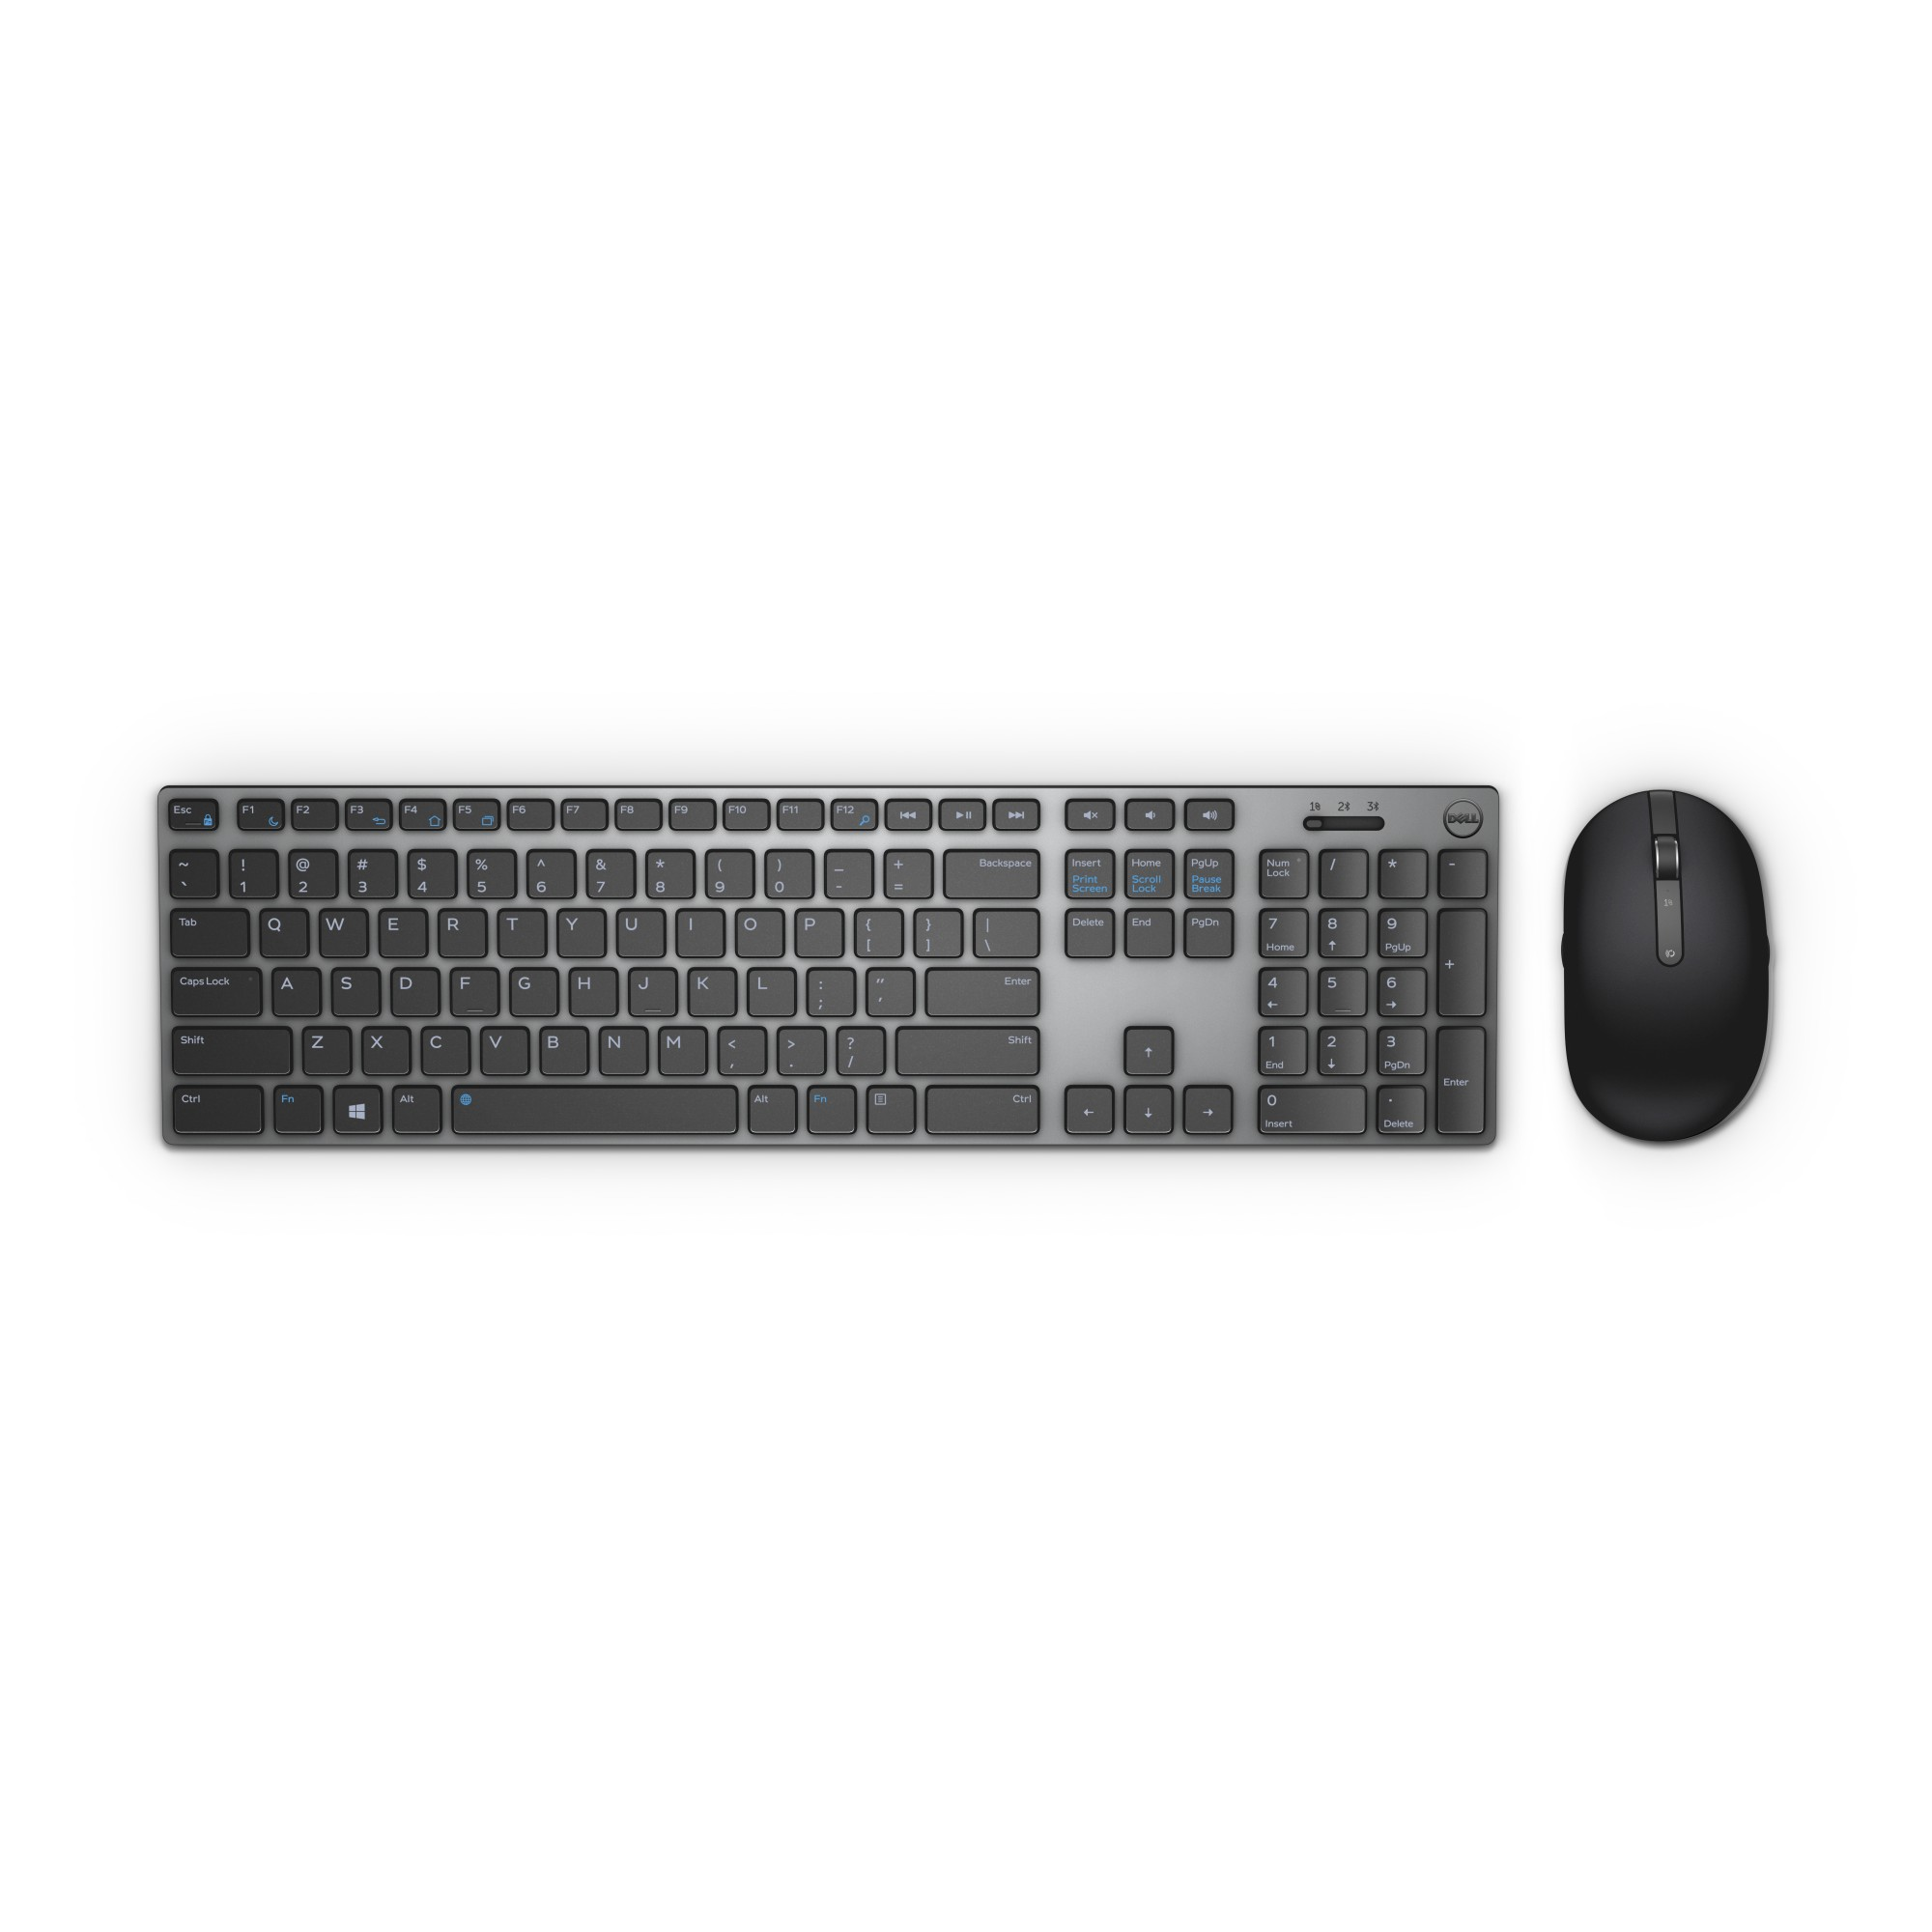 DELL KM717 keyboard RF Wireless + Bluetooth QWERTY UK English Black, Grey